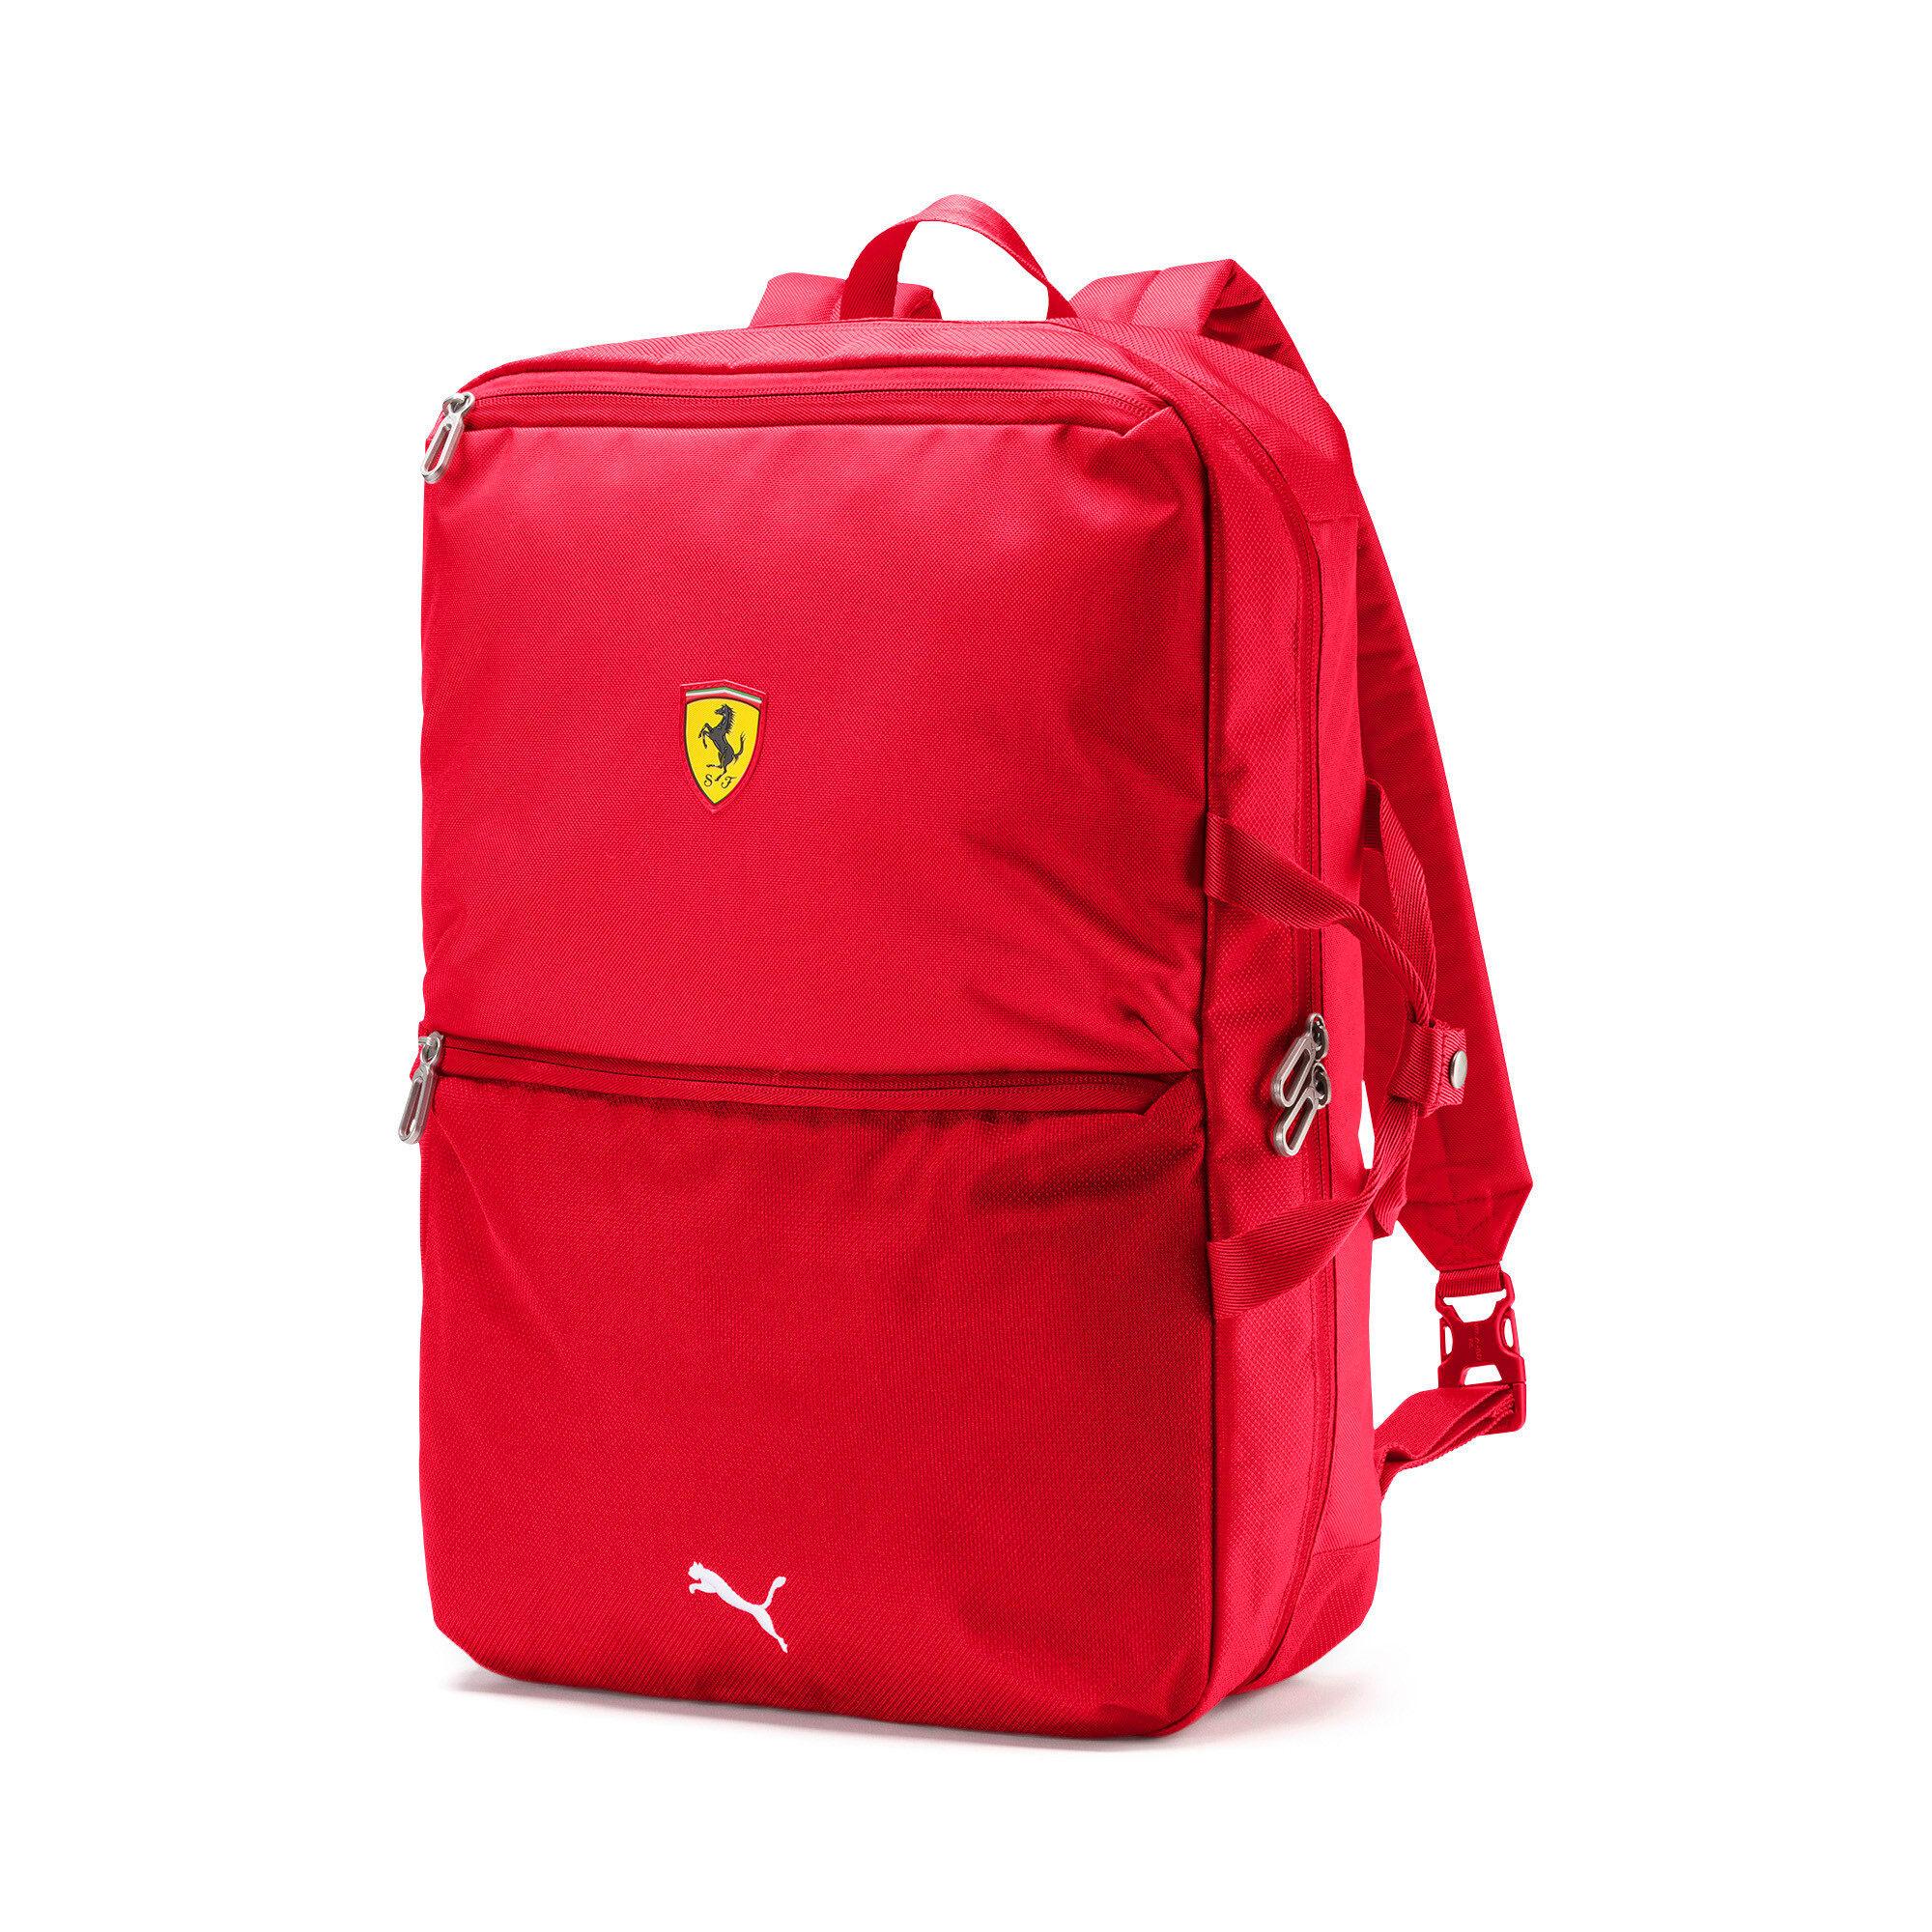 Thumbnail 1 of Ferrari Replica Backpack, Rosso Corsa, medium